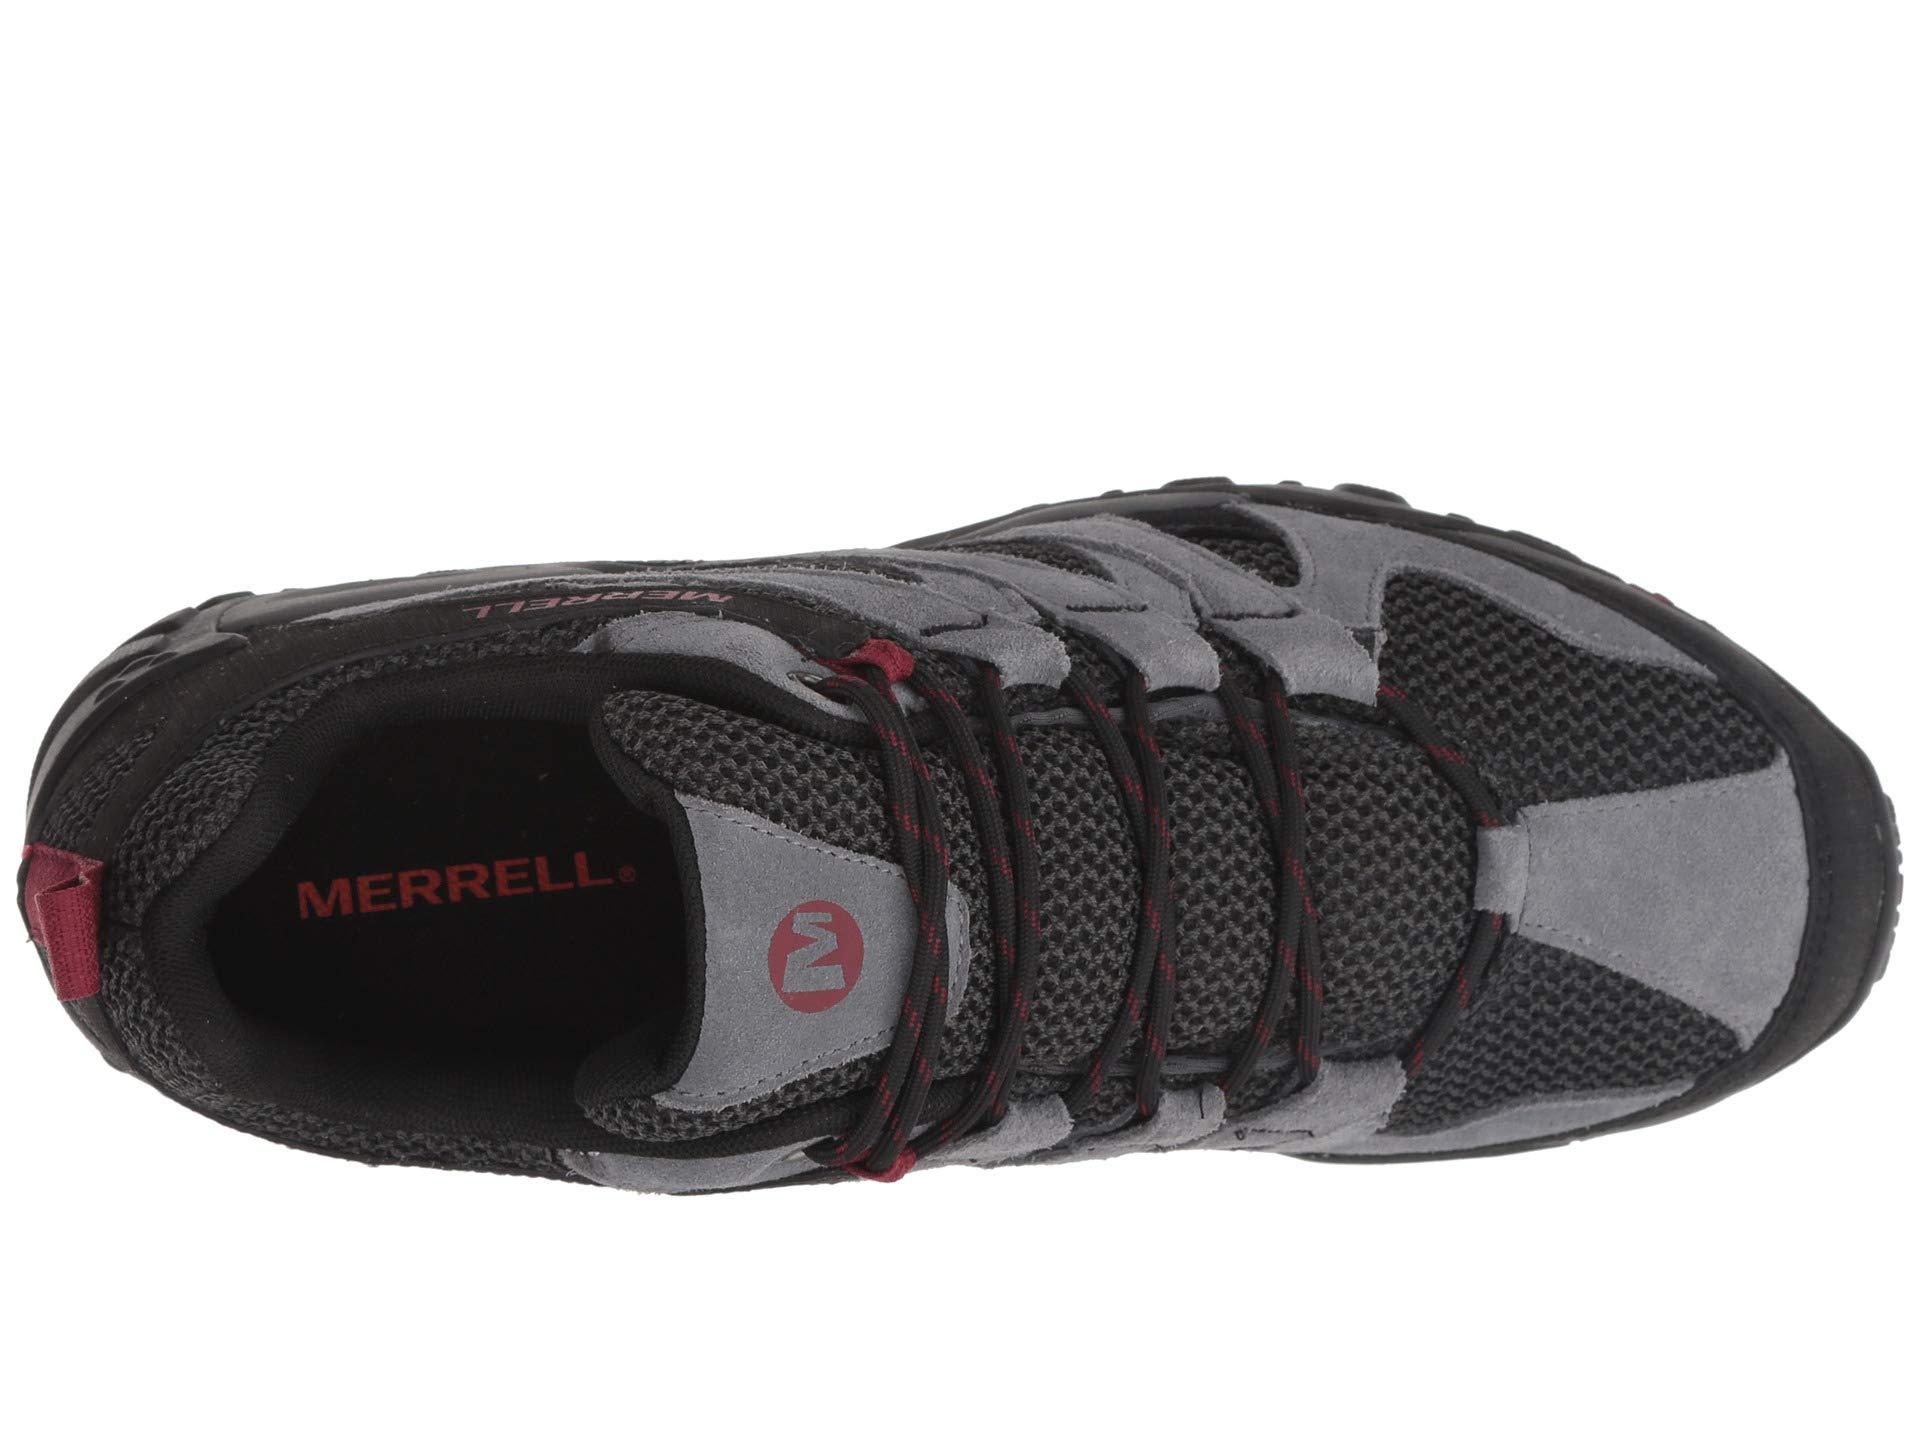 Merrell Castlerock Alverstone Merrell Alverstone 0PZw6q